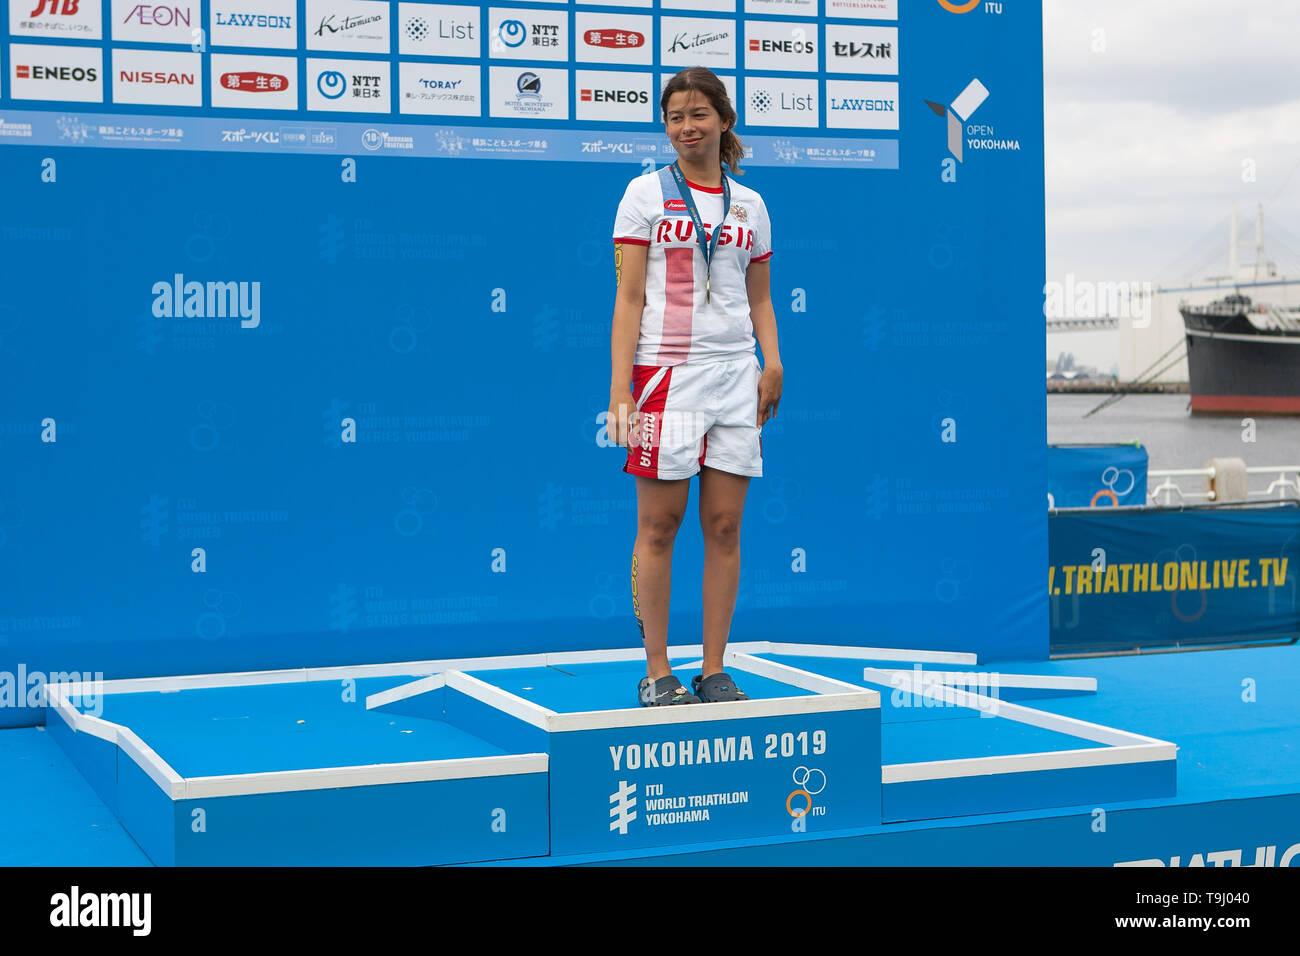 Yokohama, Japan. 18th May, 2019. 2019 ITU World Triathlon, World Paratriathlon Yokohama at Yamashita Park and Minato Mirai, Yokohama. Plotnikova (Photos by Michael Steinebach/AFLO) Credit: Aflo Co. Ltd./Alamy Live News Stock Photo